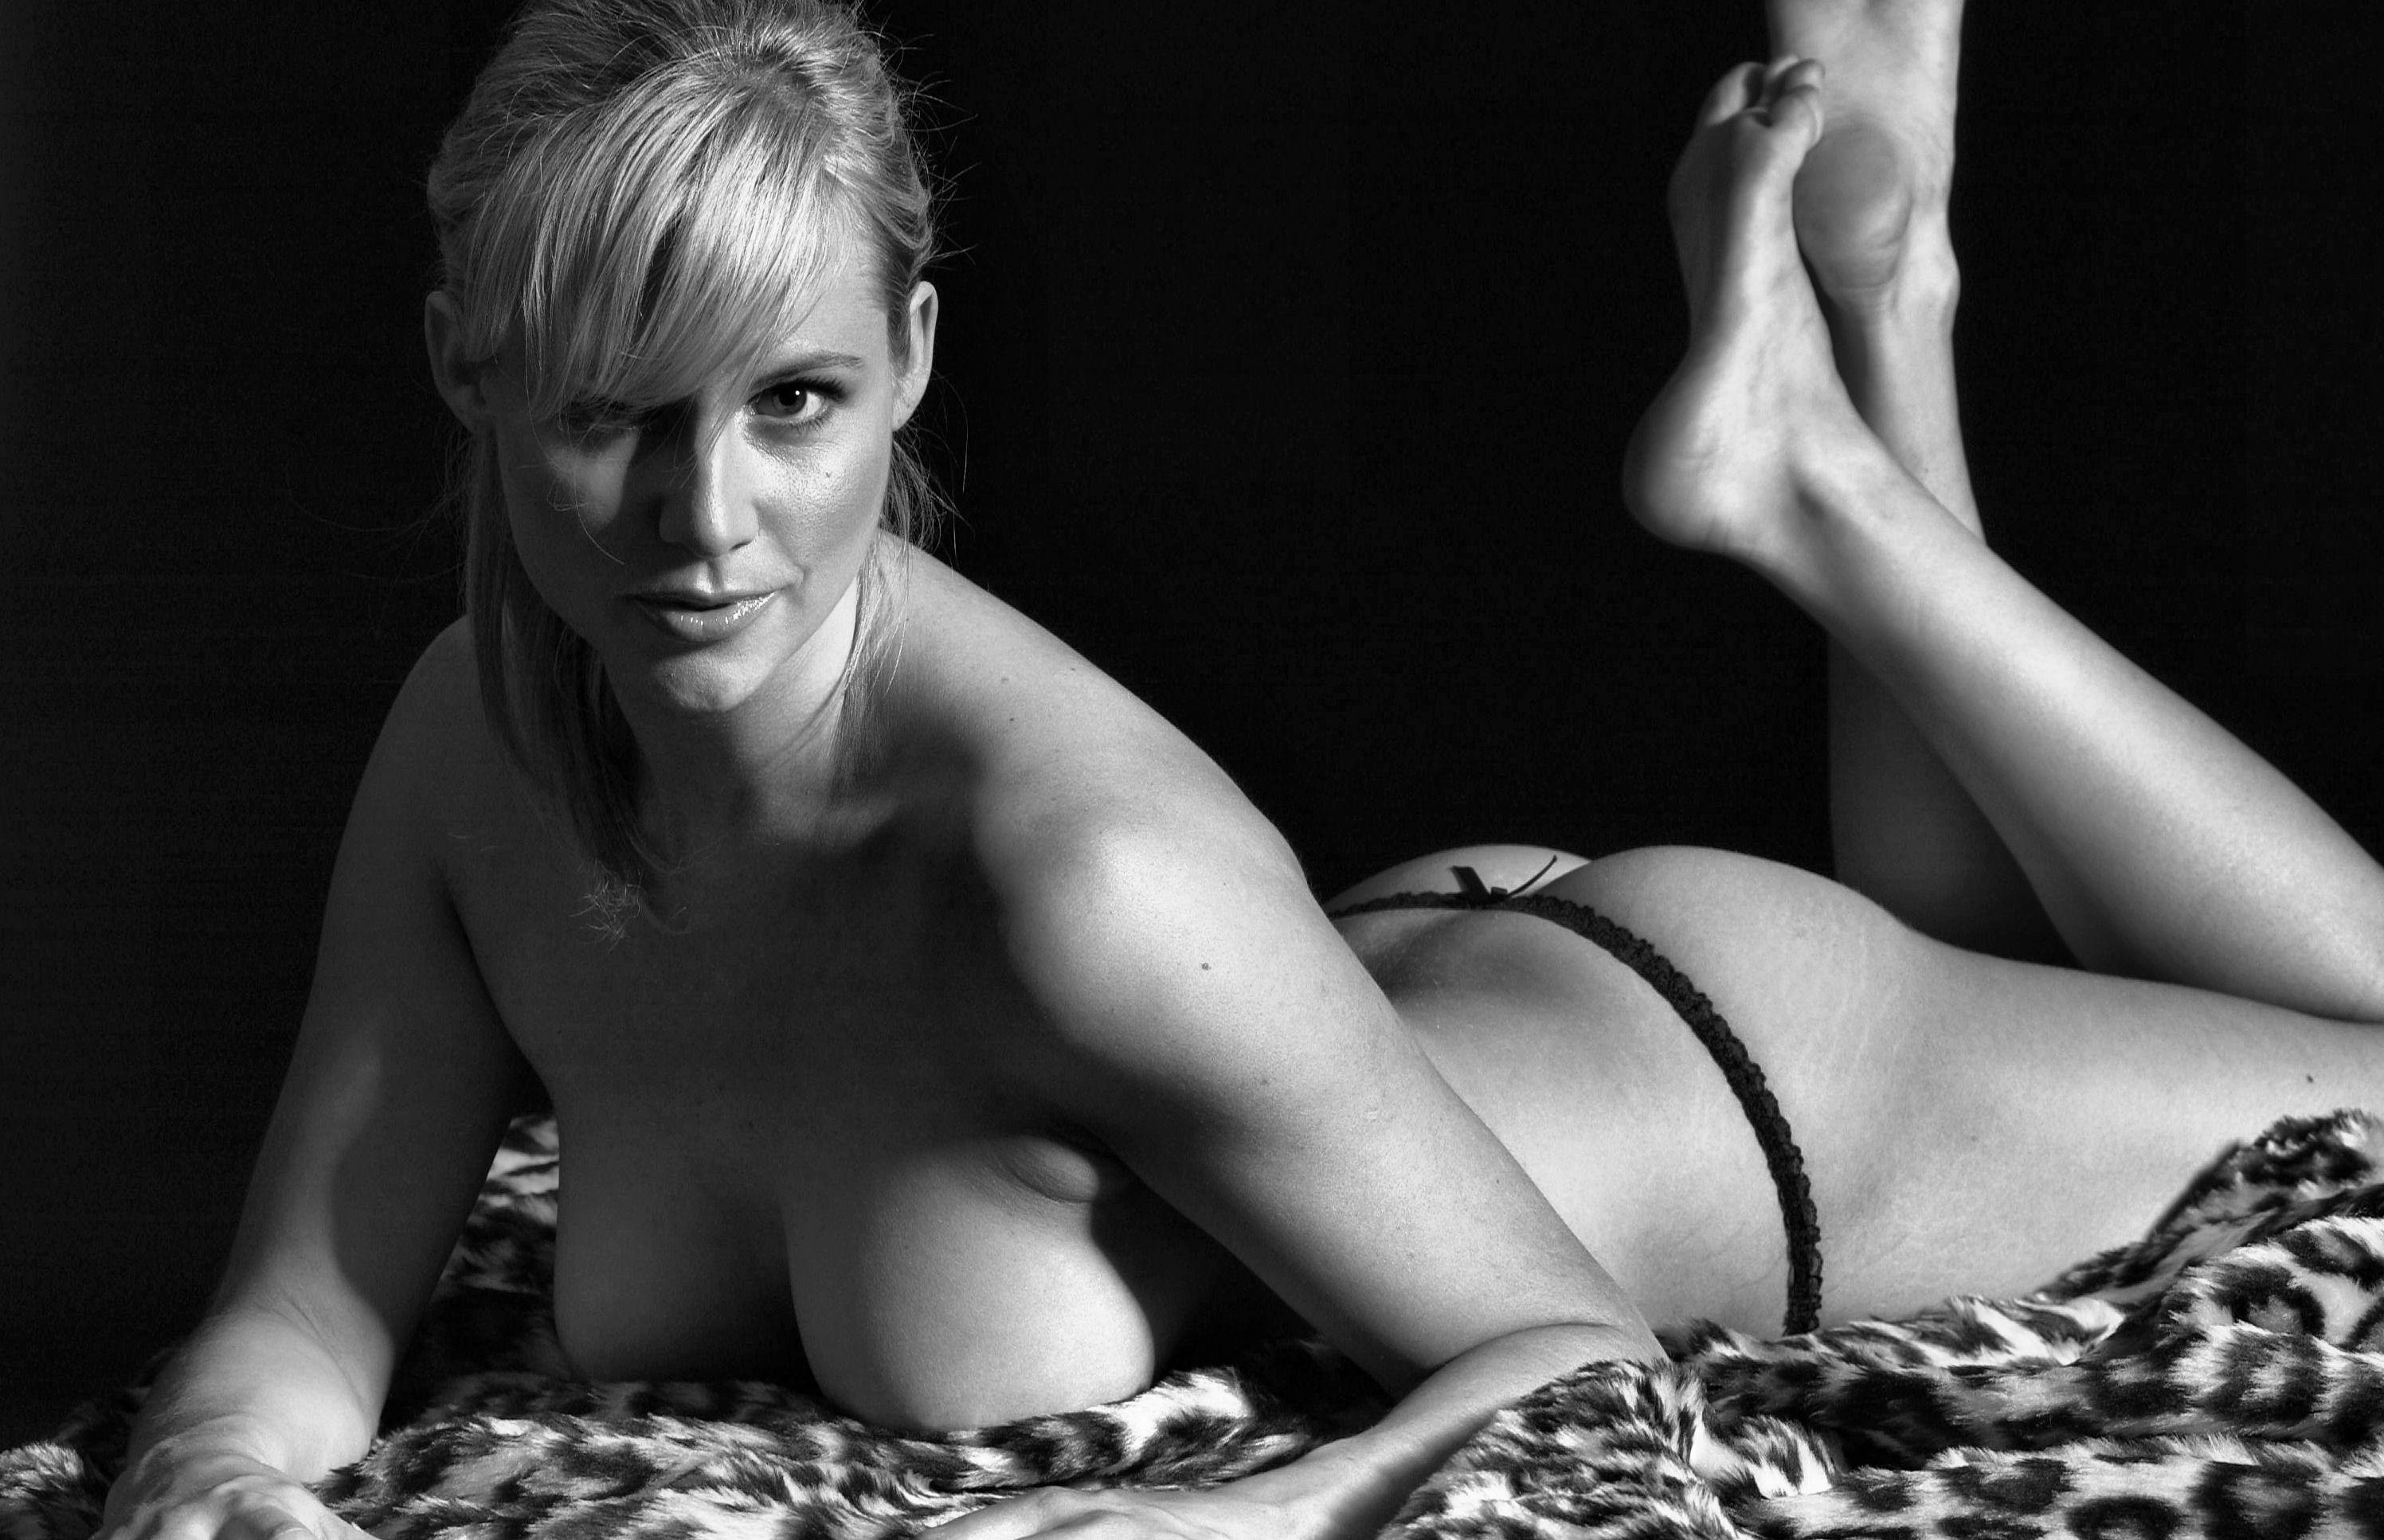 Sex Hd Mobile Pics Babylon X Abi Titmuss Greatest Celebrities Sex Pov